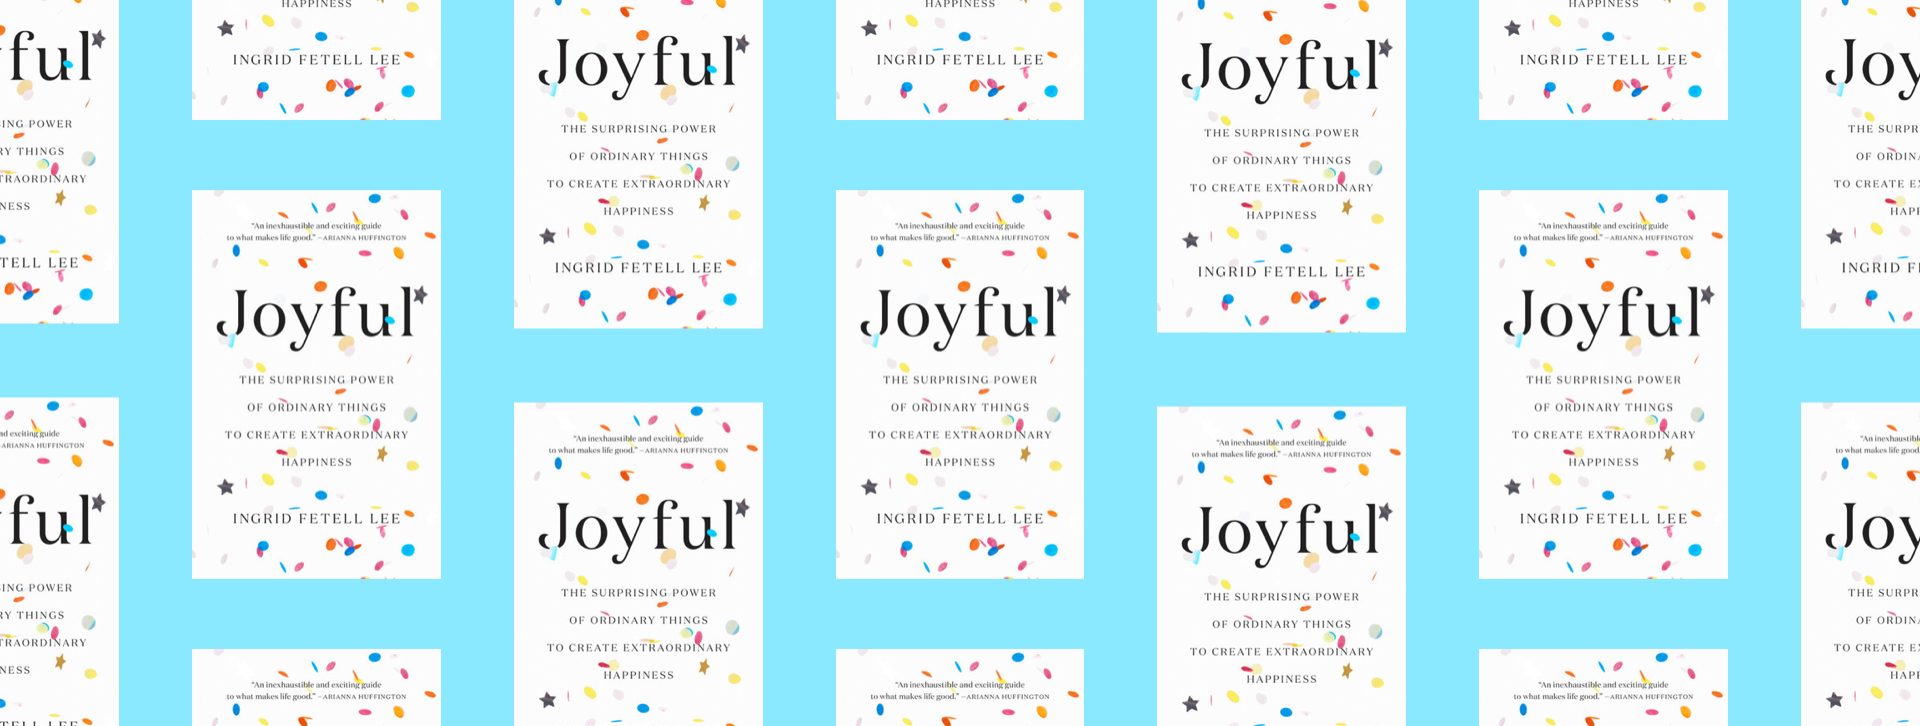 Joyful.png